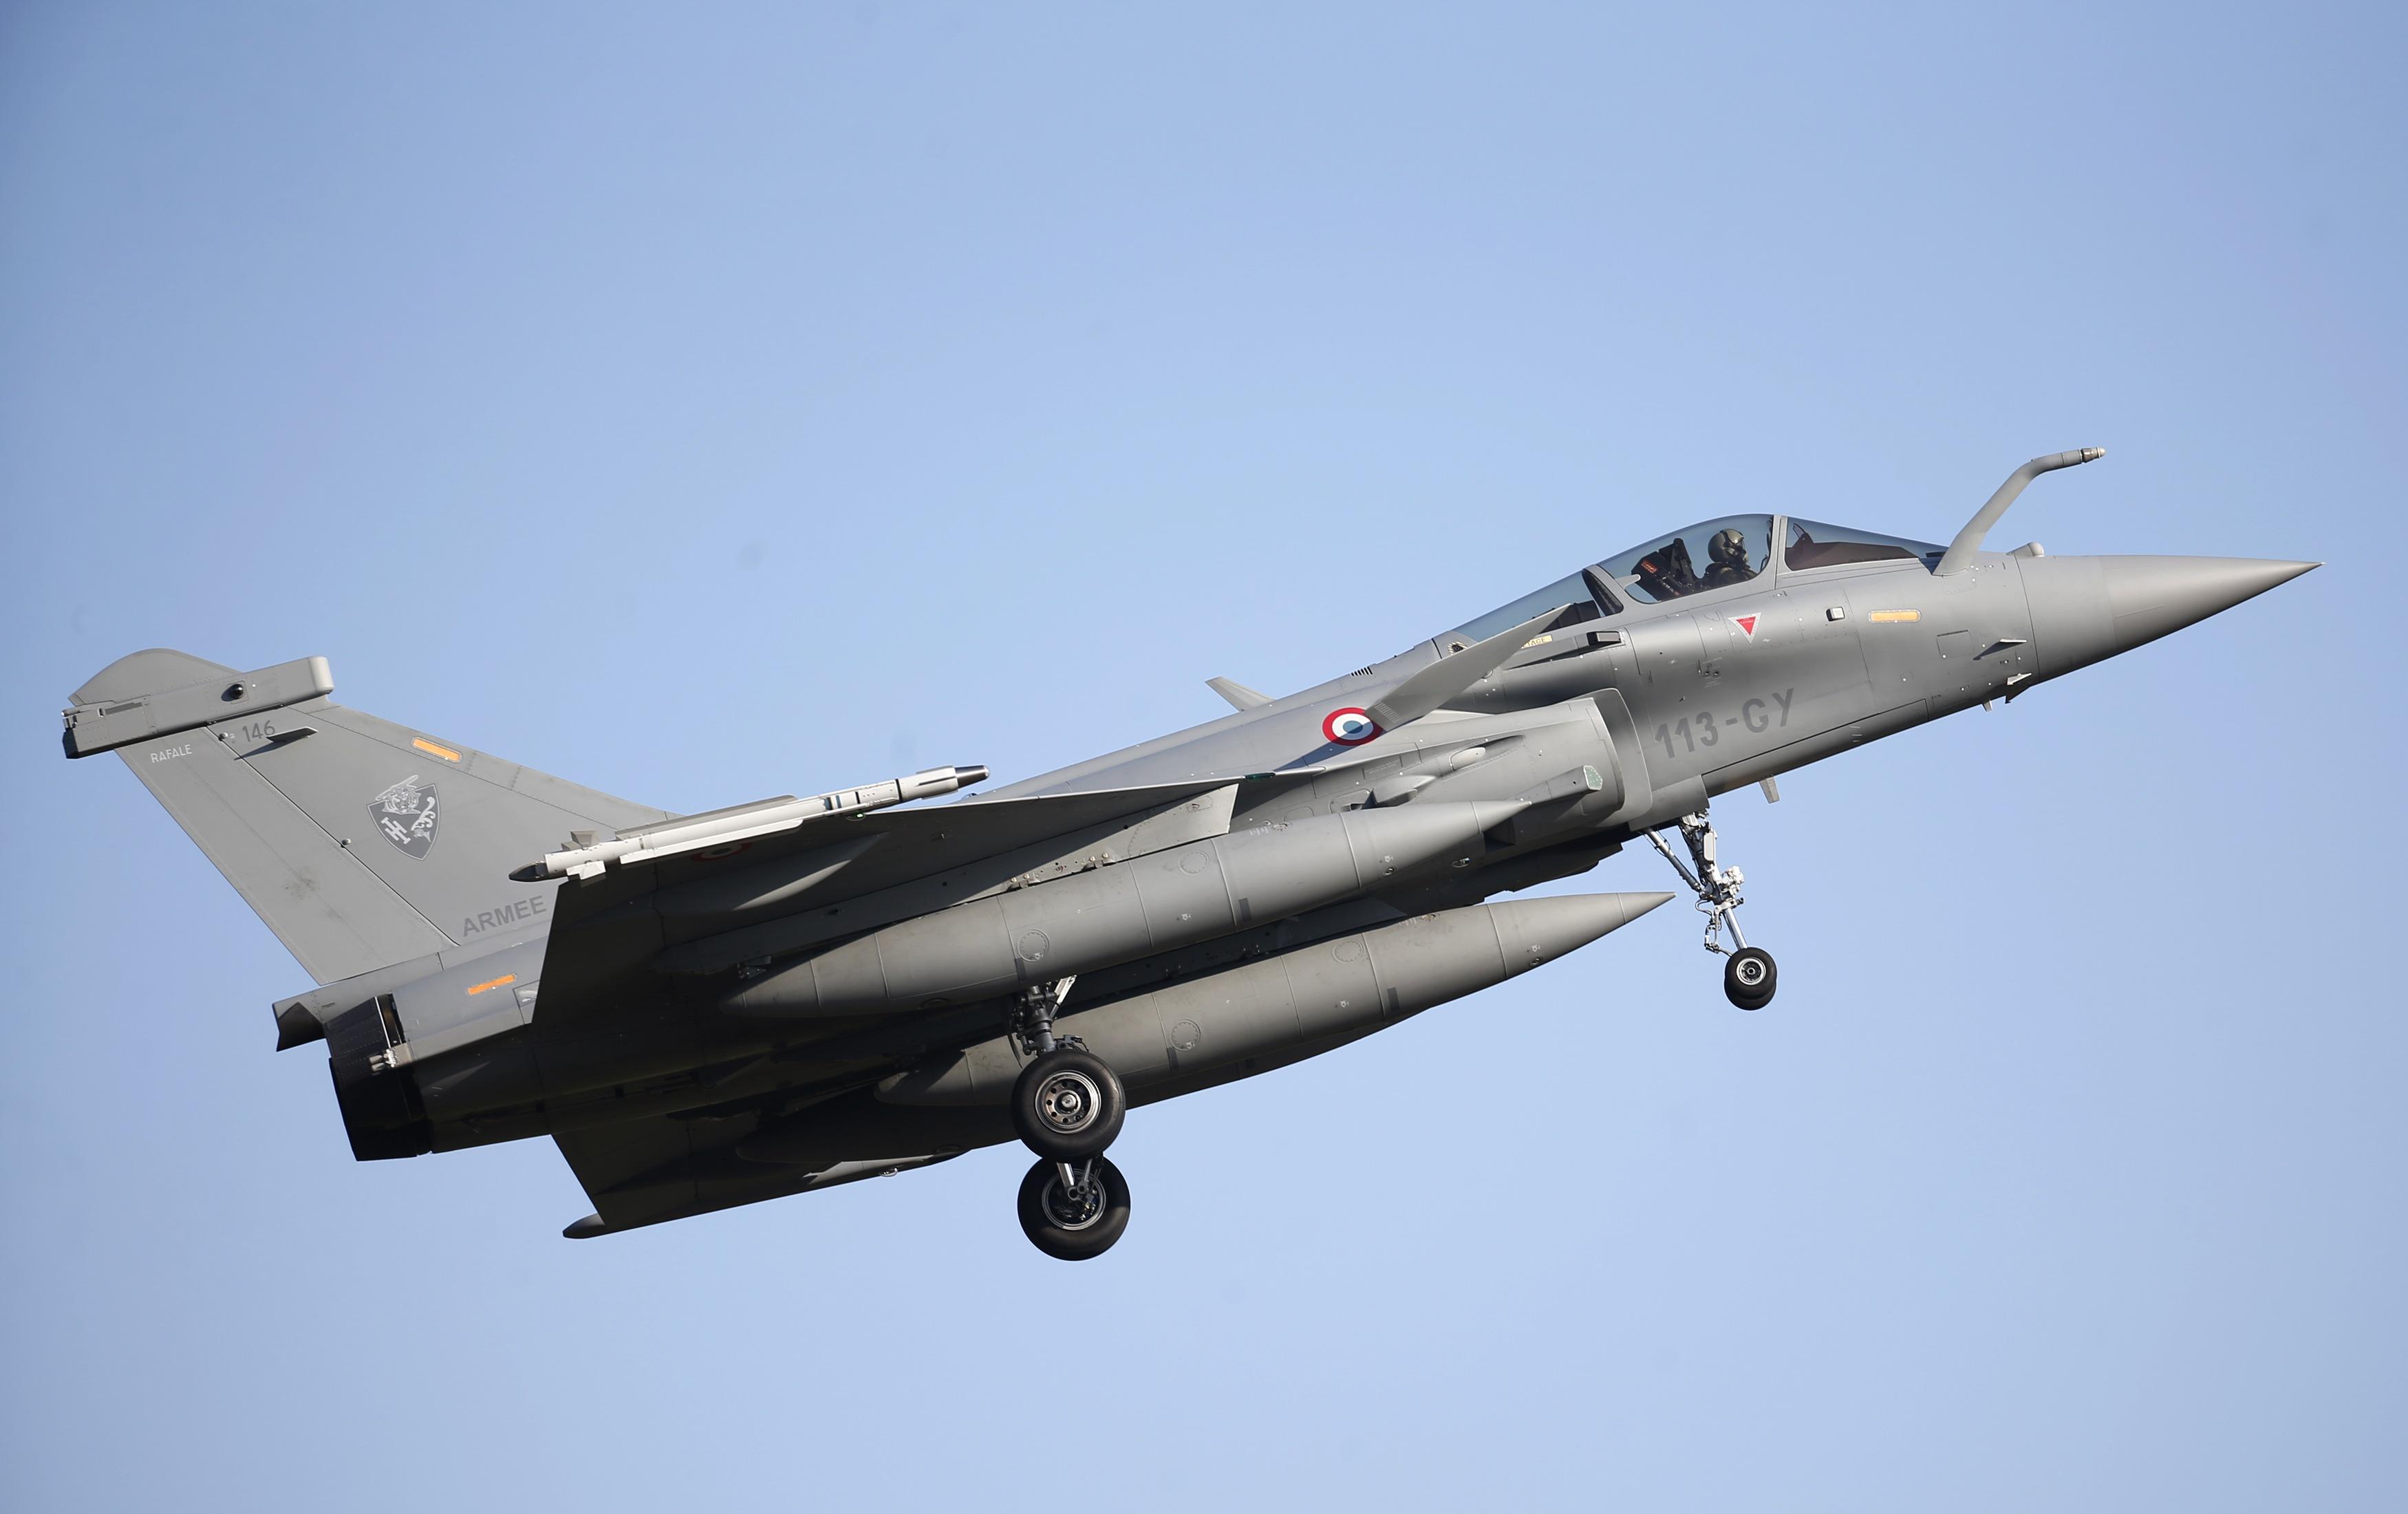 France and Qatar seal $7 billion Rafale fighter jet deal